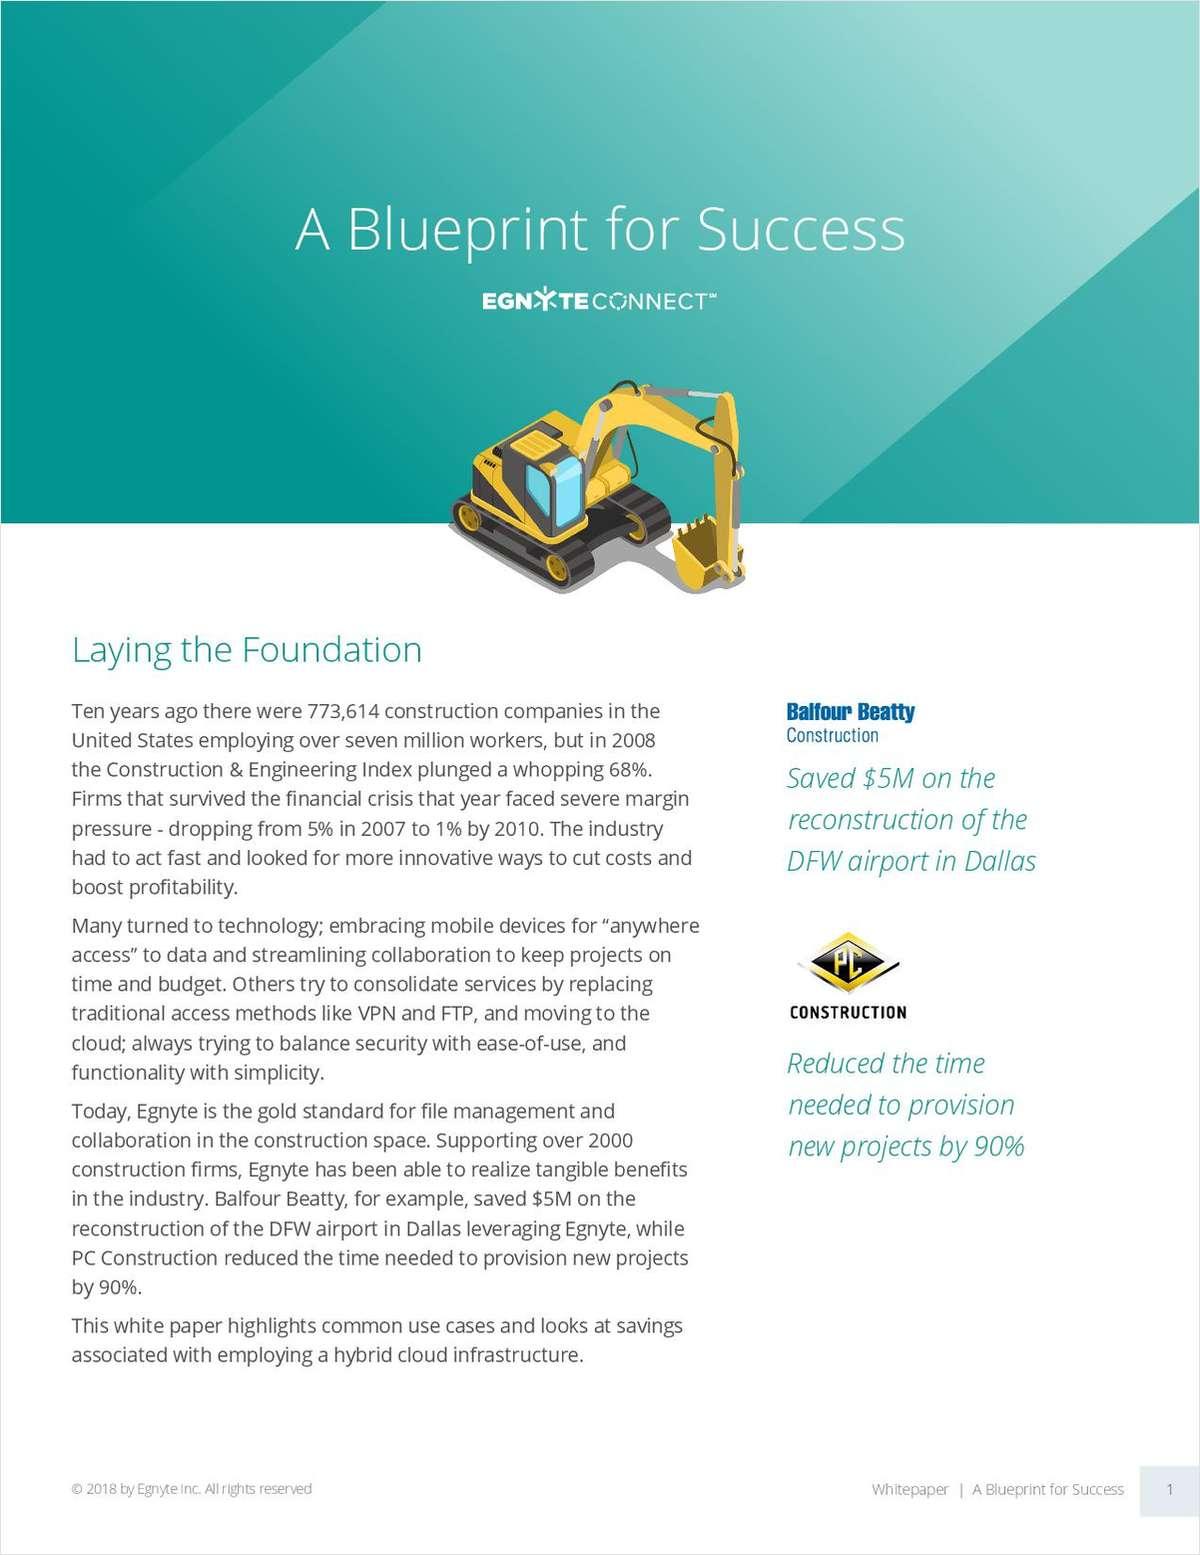 Hybrid Cloud Infrastructure: A Blueprint for Success